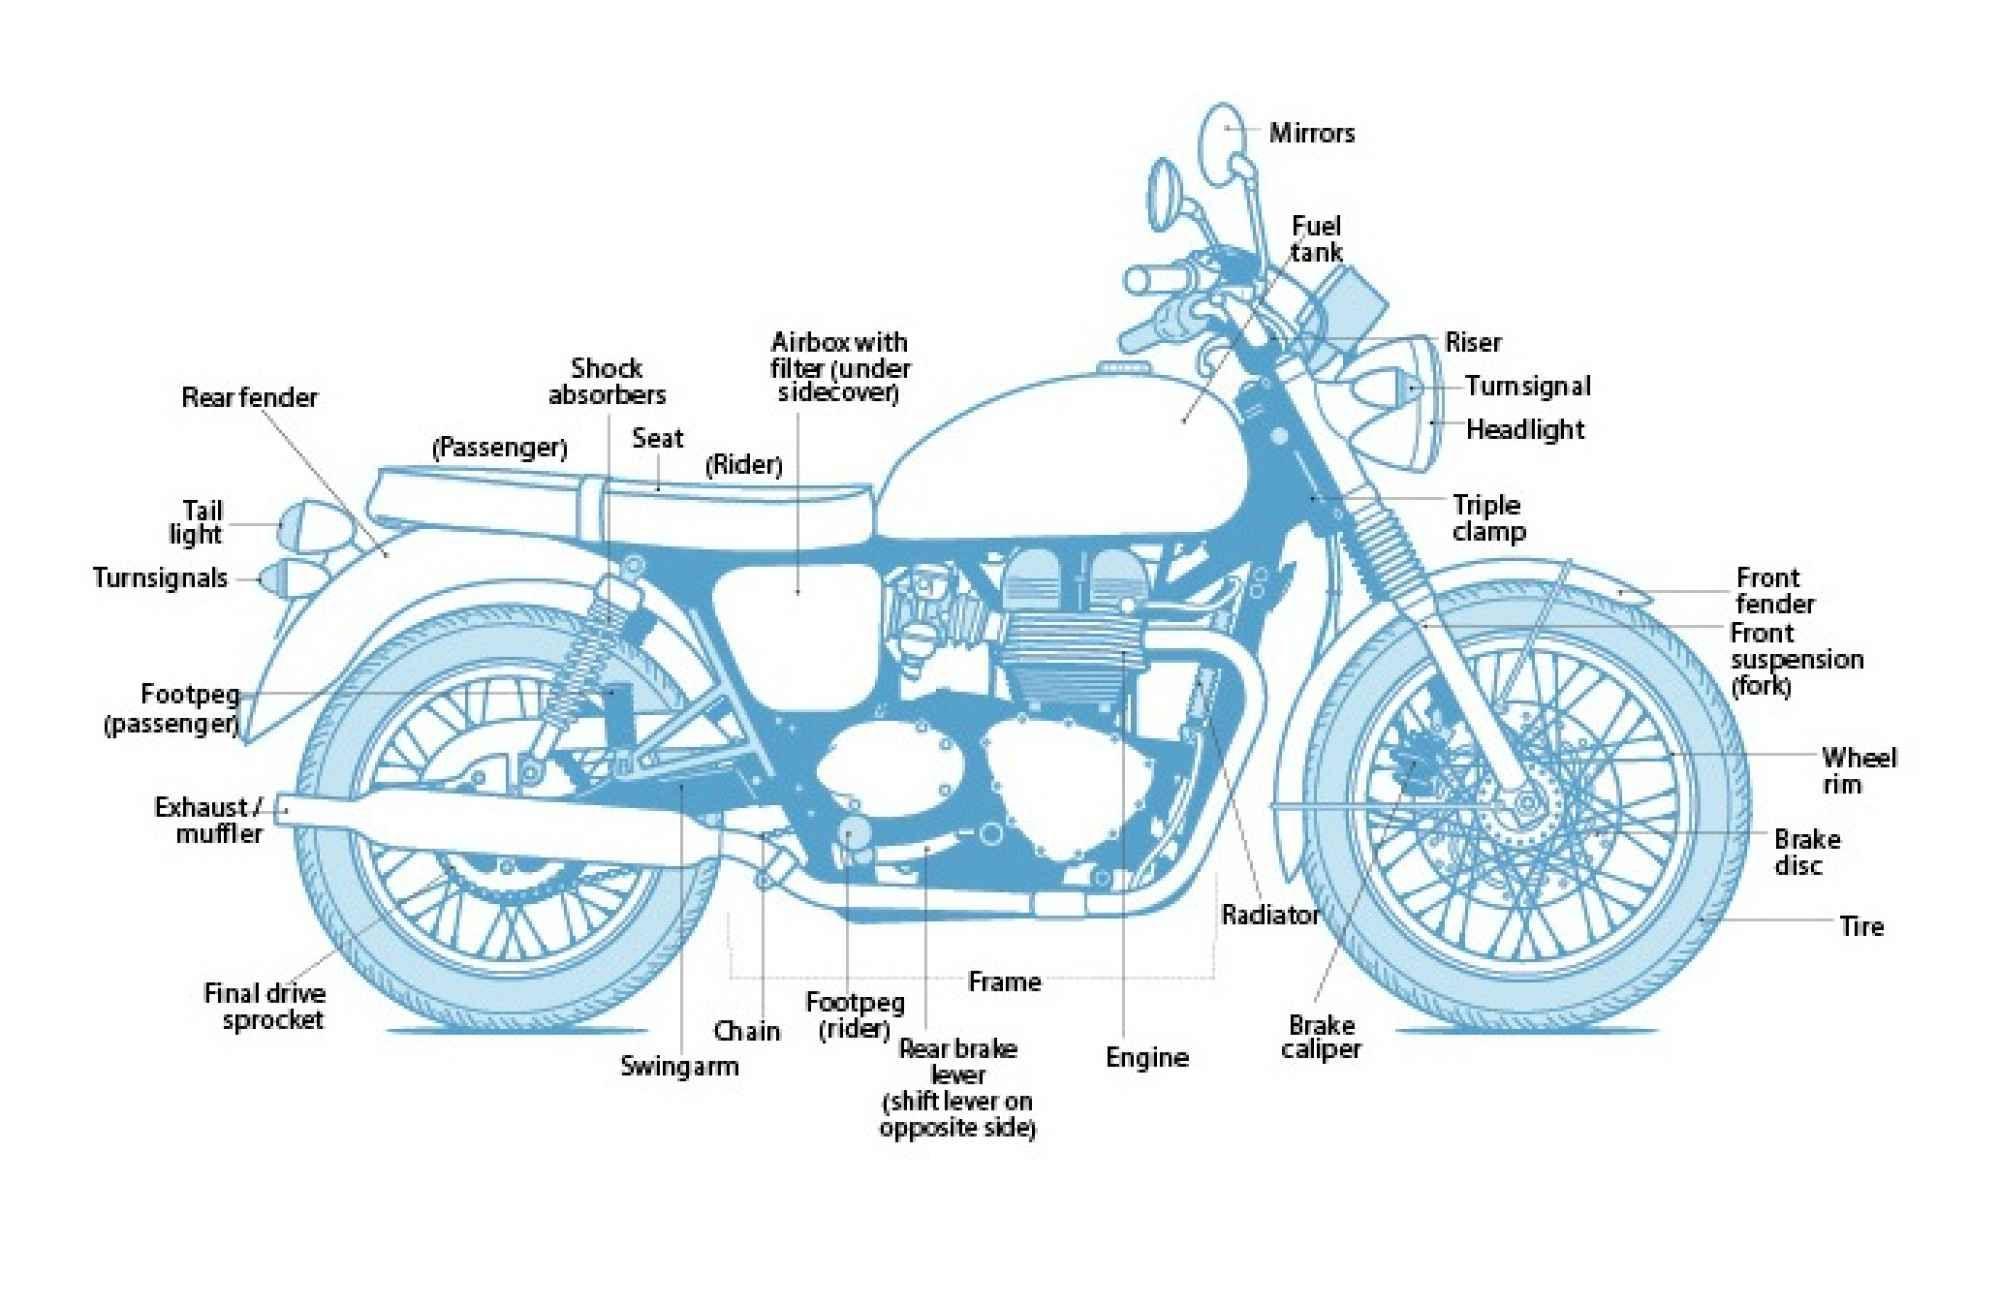 small resolution of motorcycle diagram motorcycles motorcycle motorcycle parts harley davidson motorcycle microfiche harley davidson motorcycle diagrams